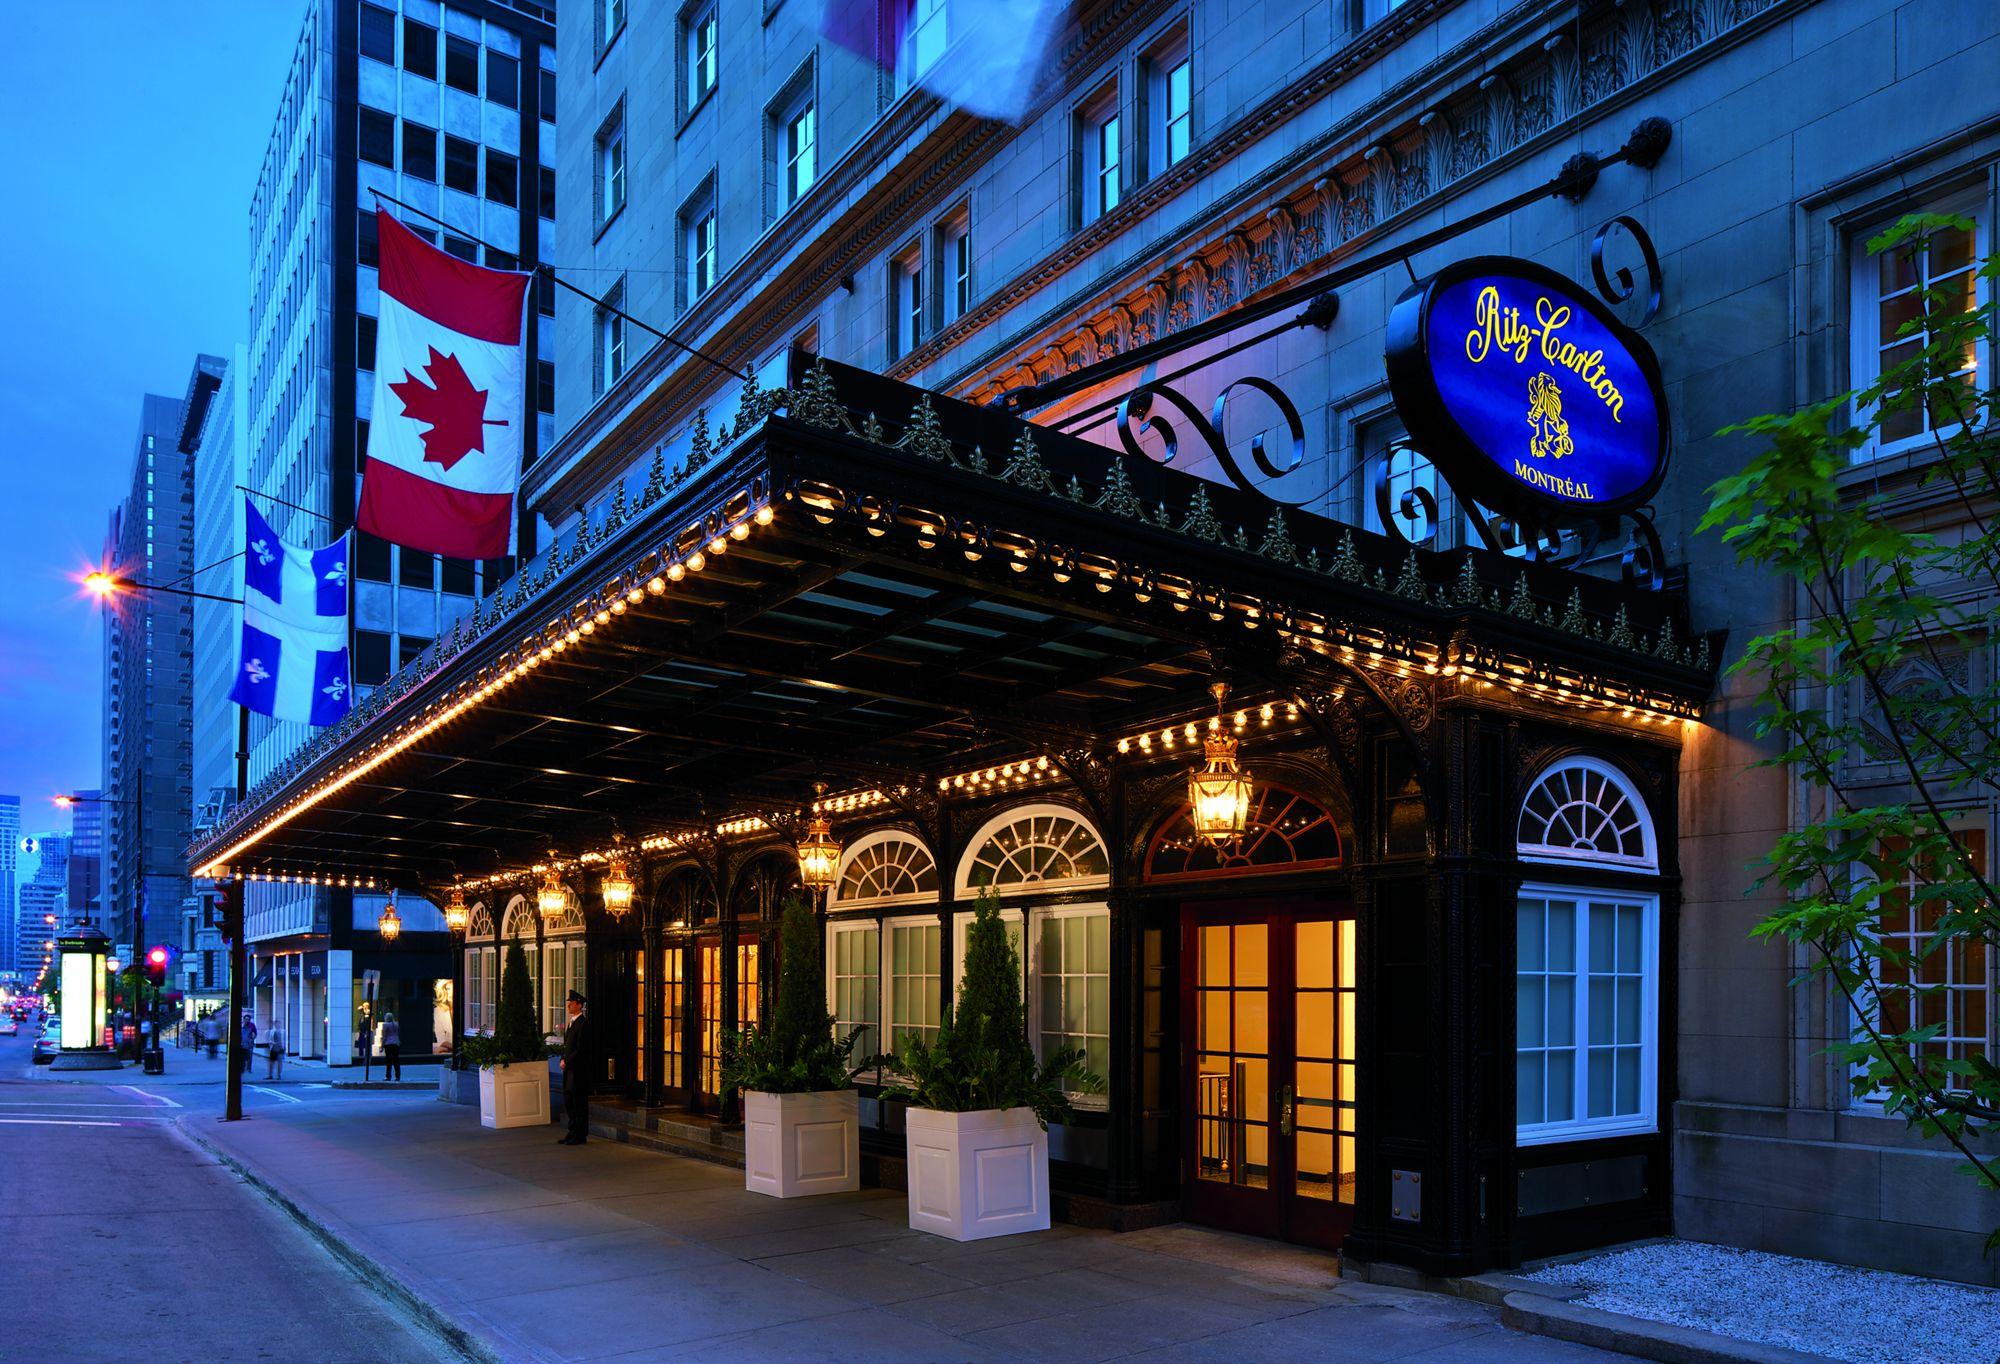 The Ritz Carlton Hotel in Montreal (ritzcarlton)